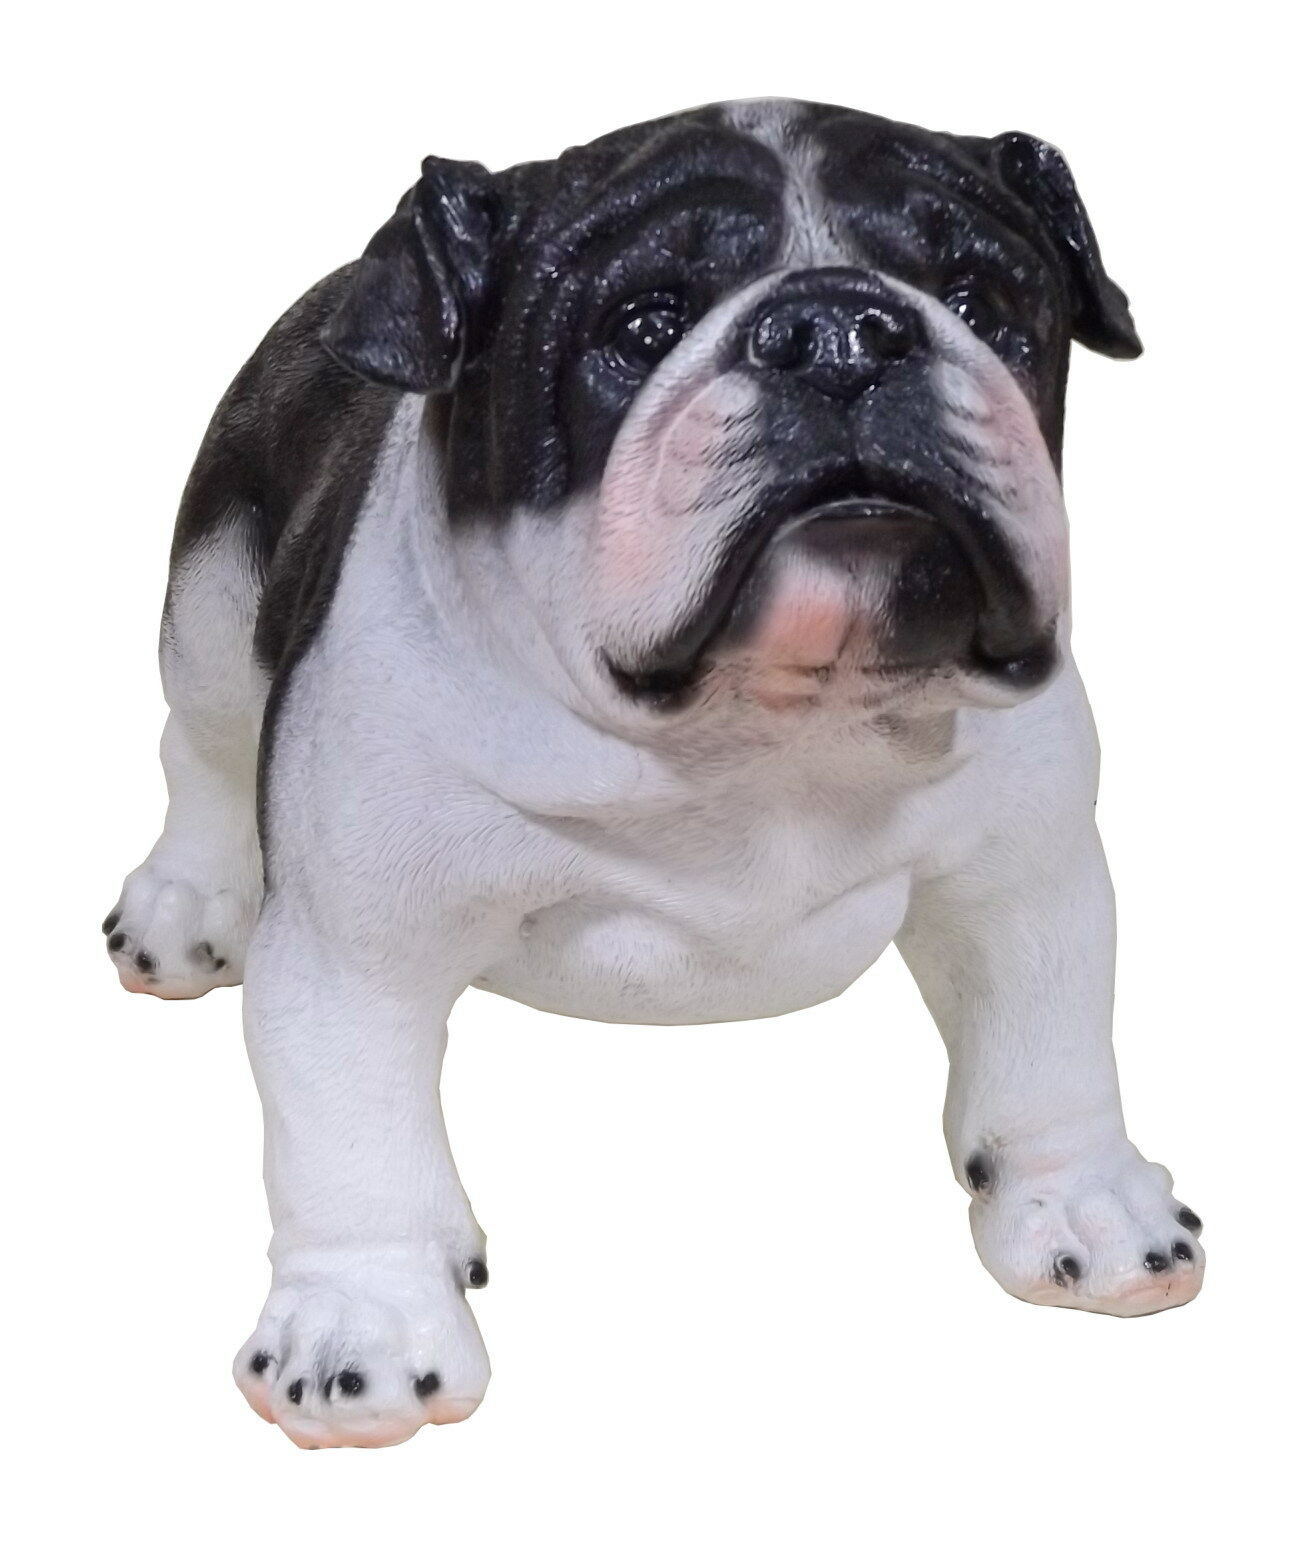 Großartig Englisch Bulldog Färbung Seiten Ideen - Ideen fortsetzen ...